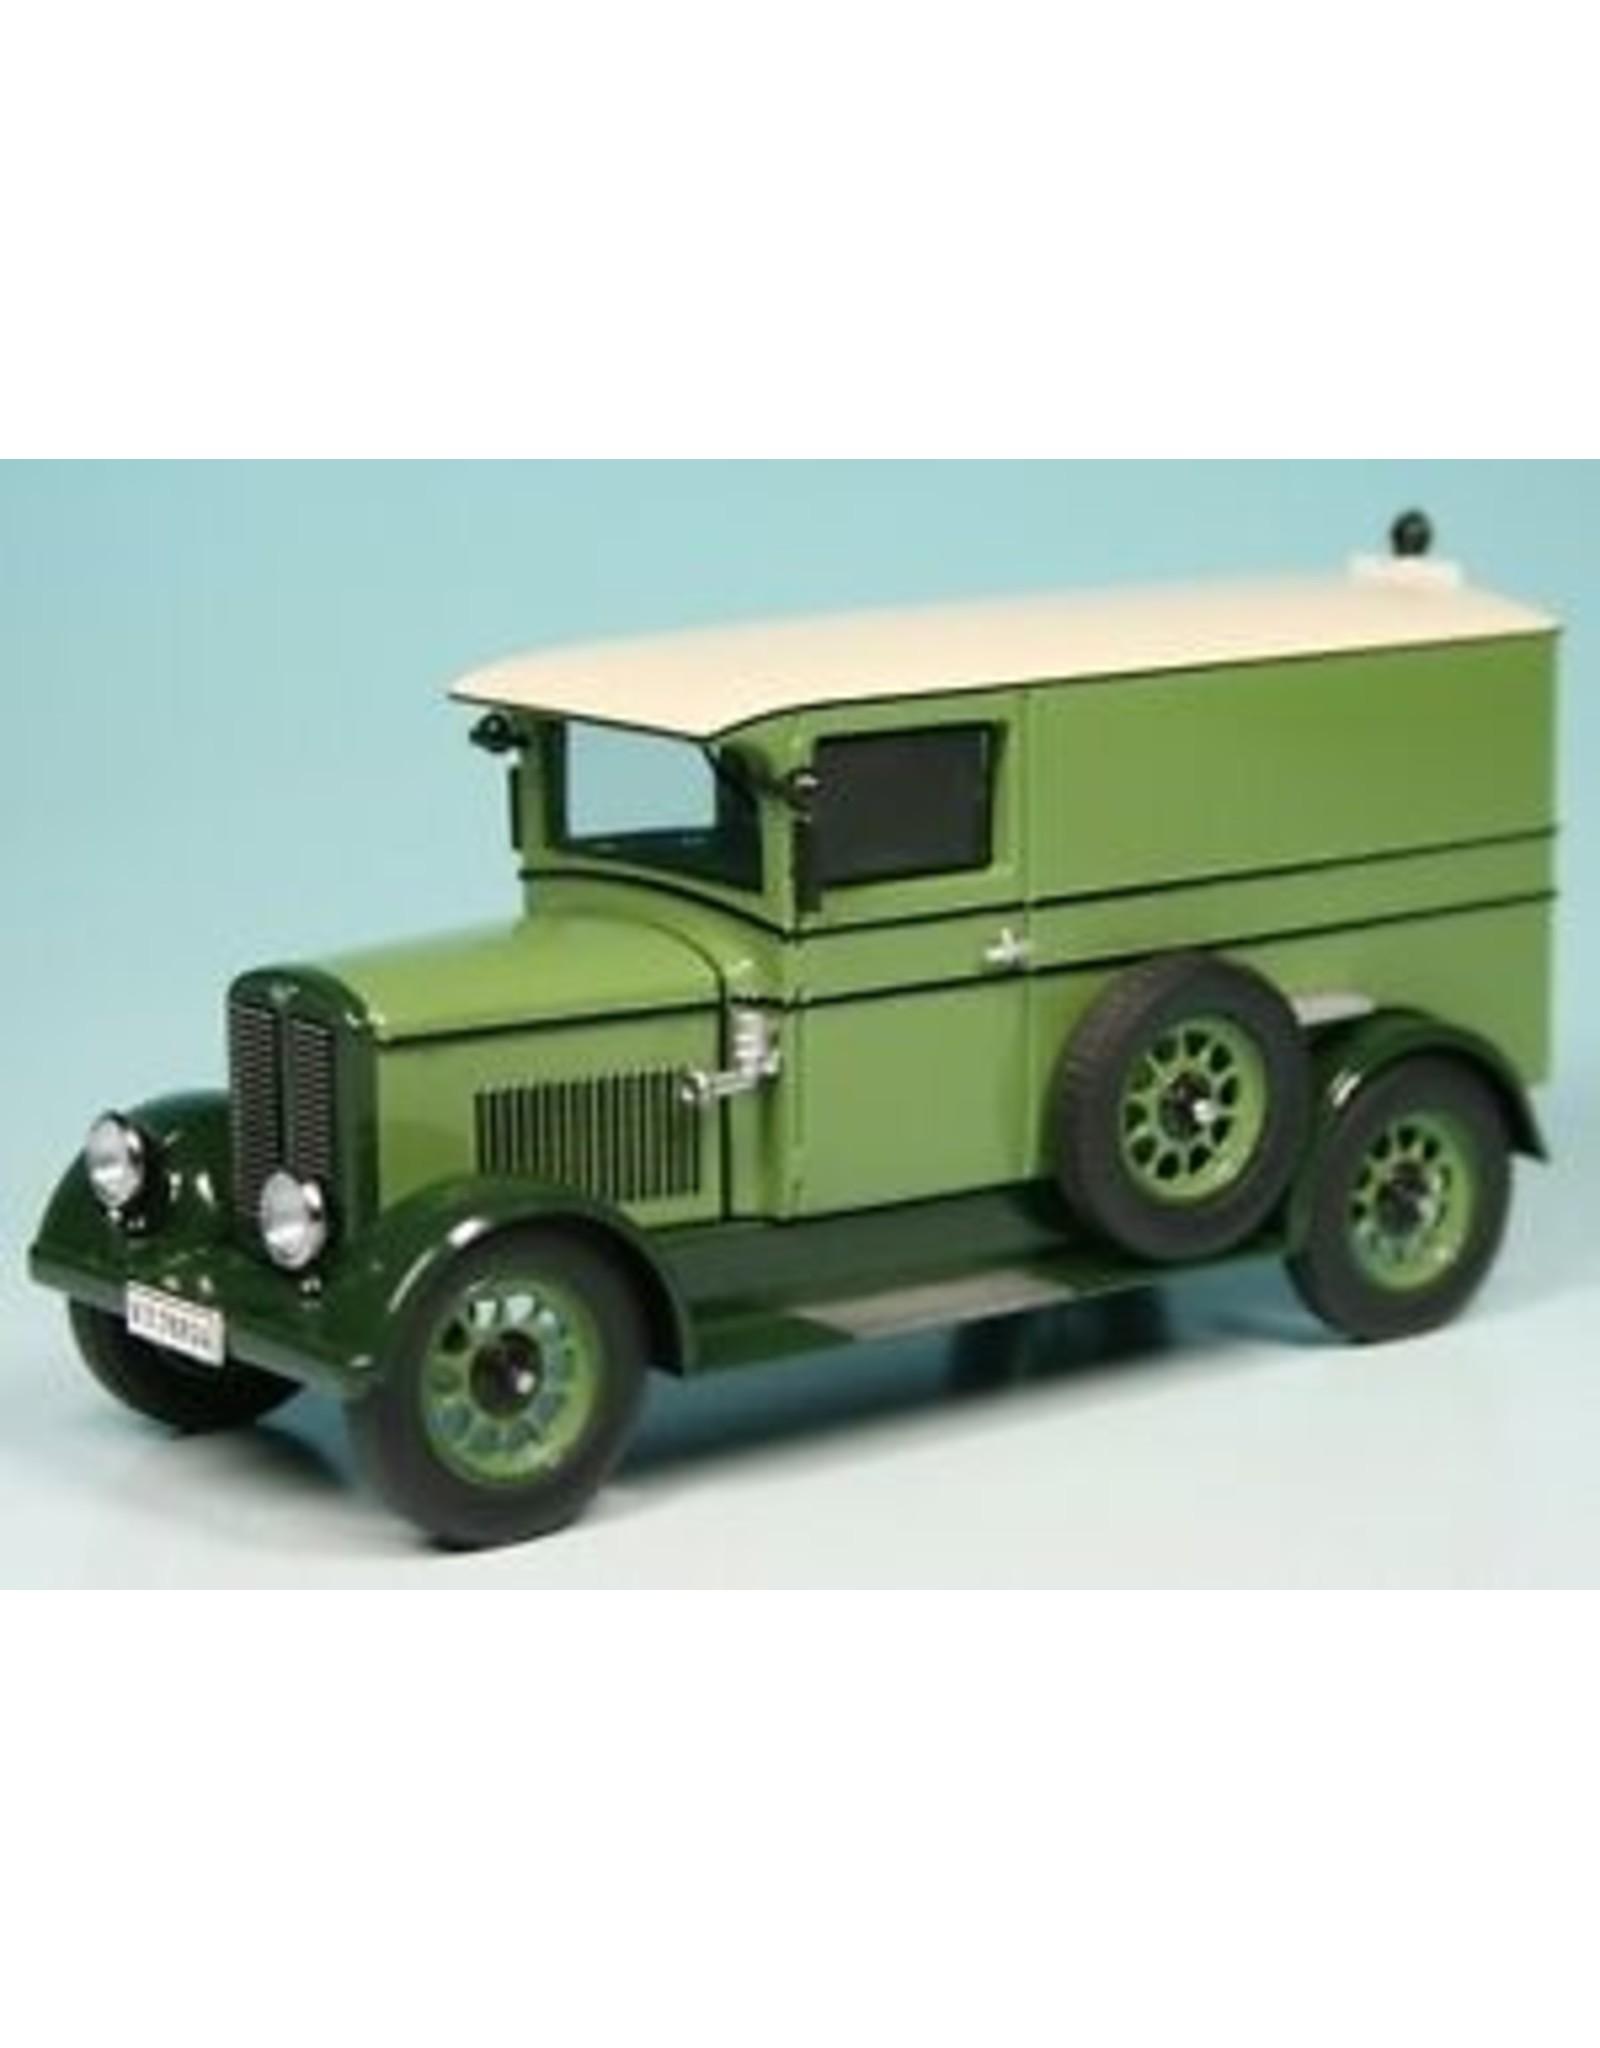 Phänomen Phänomen Granit 25 Van 1950-1953 - 1:43 - Premium ClassiXXs